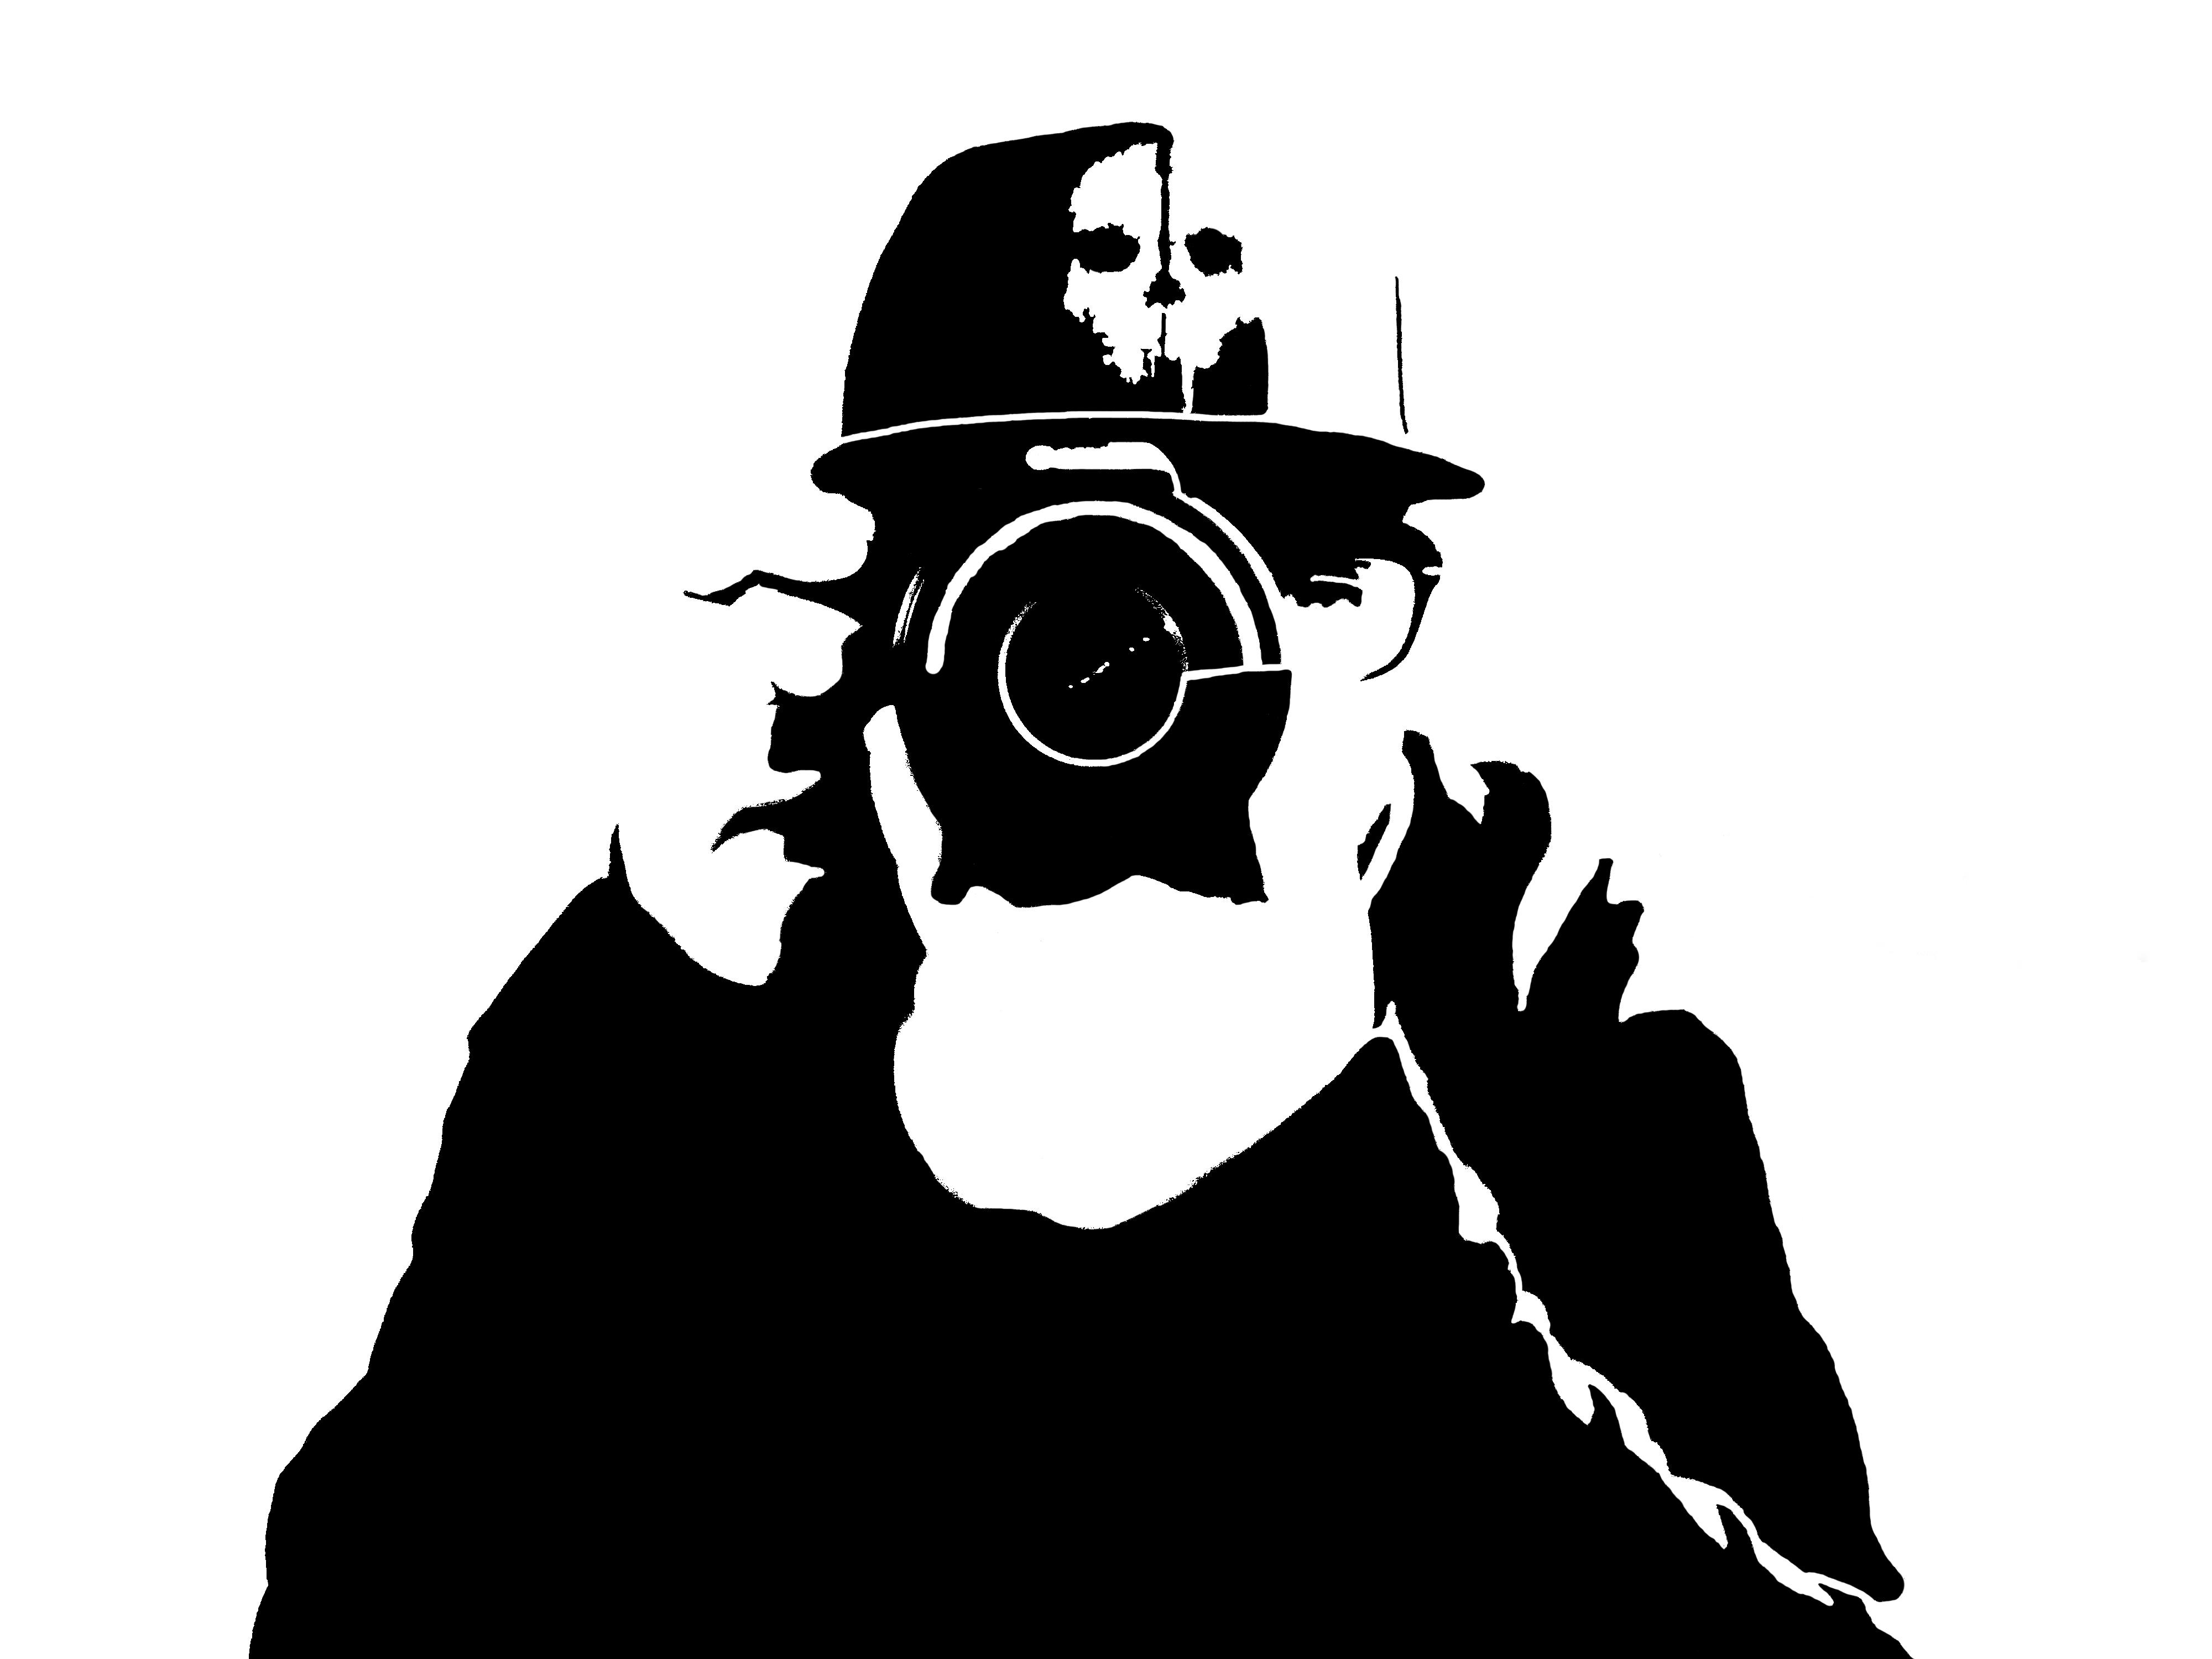 stencil | DarksterMedia  stencil | Darks...